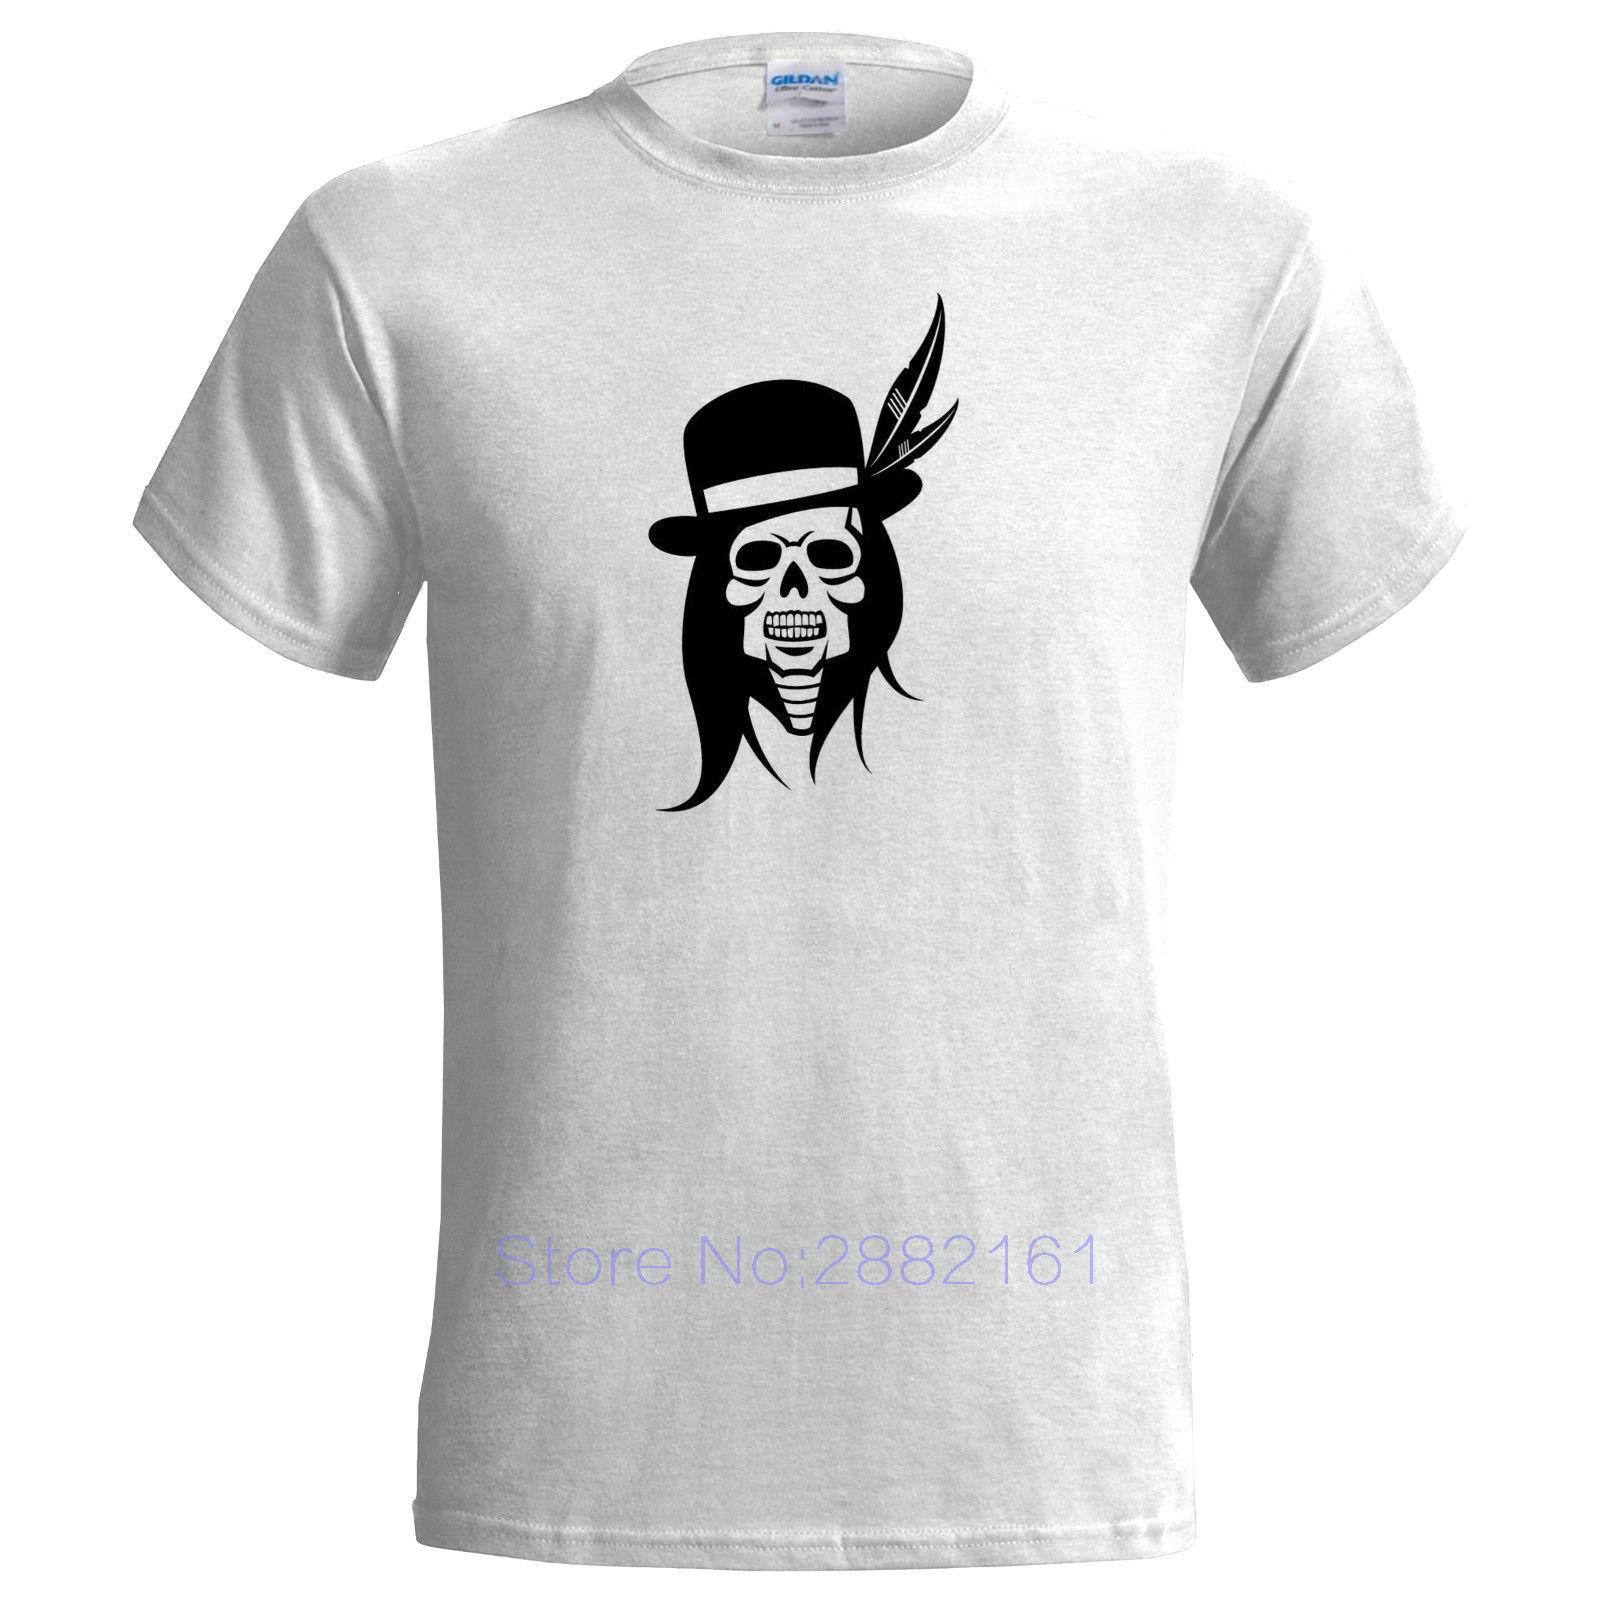 Design t shirt price - Mens T Shirts Fashion 2017 Cool Indian Chief Skull Design Mens T Shirt Rock Native American